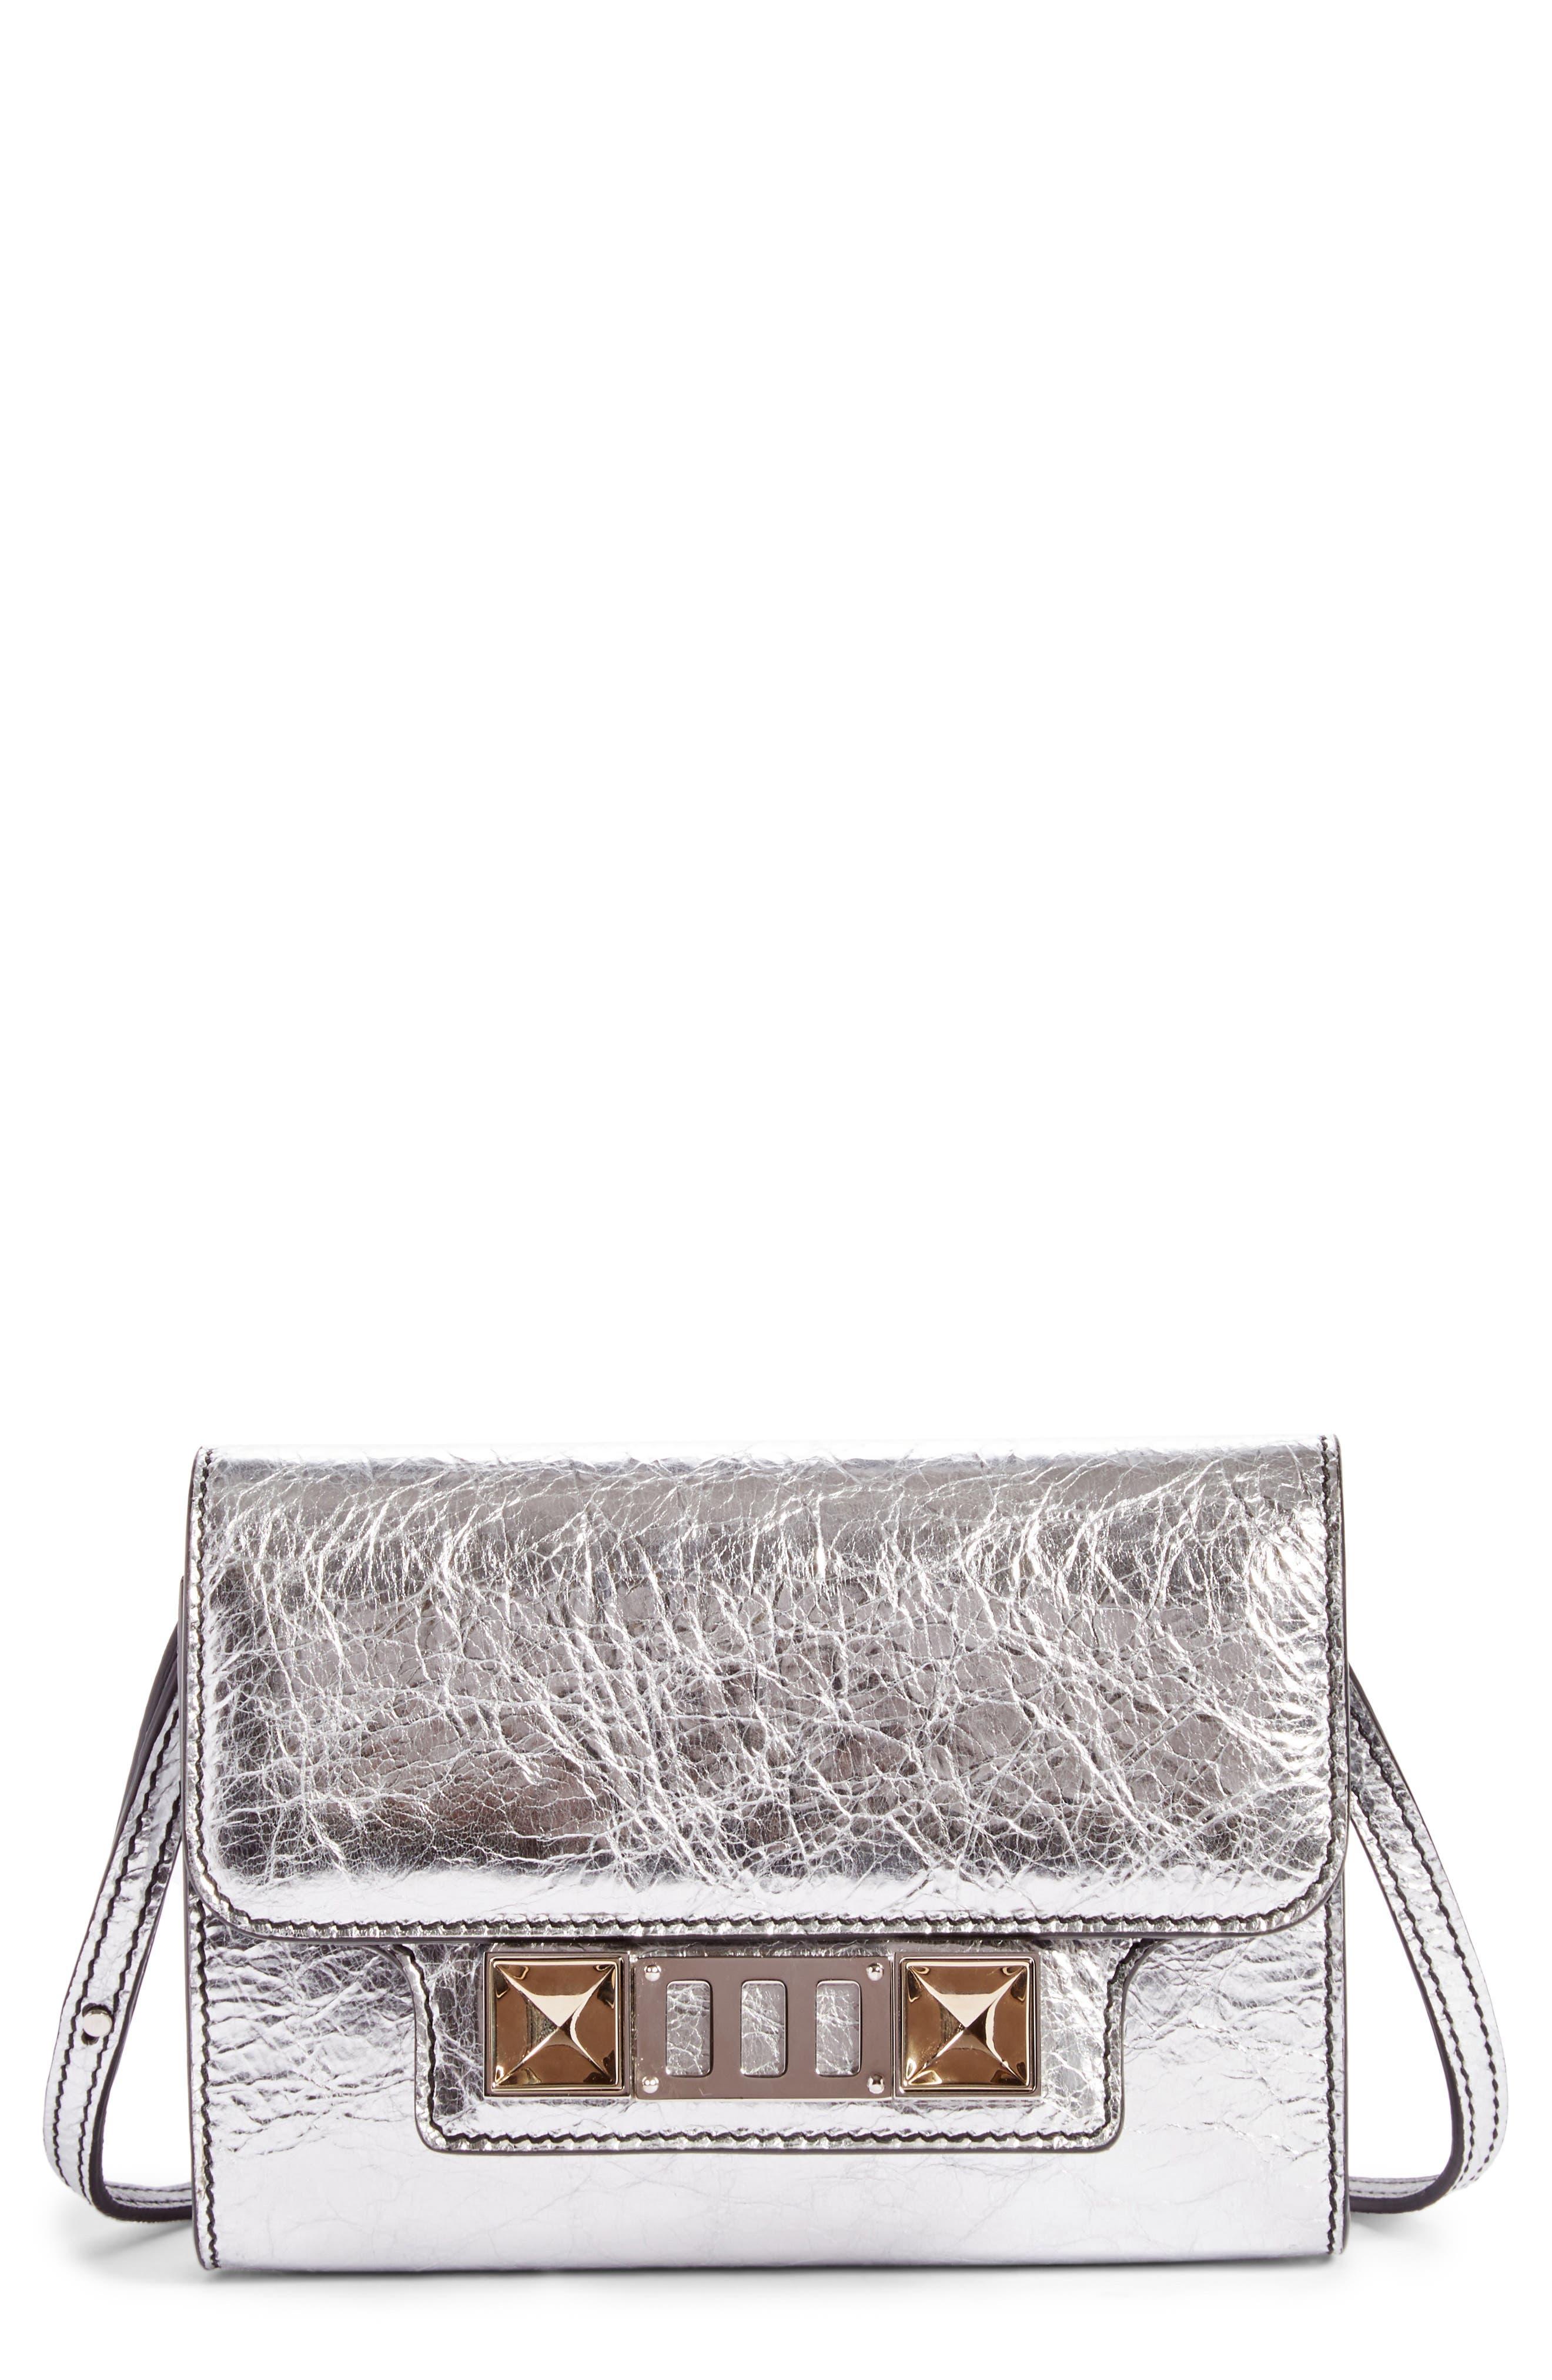 Main Image - Proenza Schouler PS11 Leather Crossbody Wallet